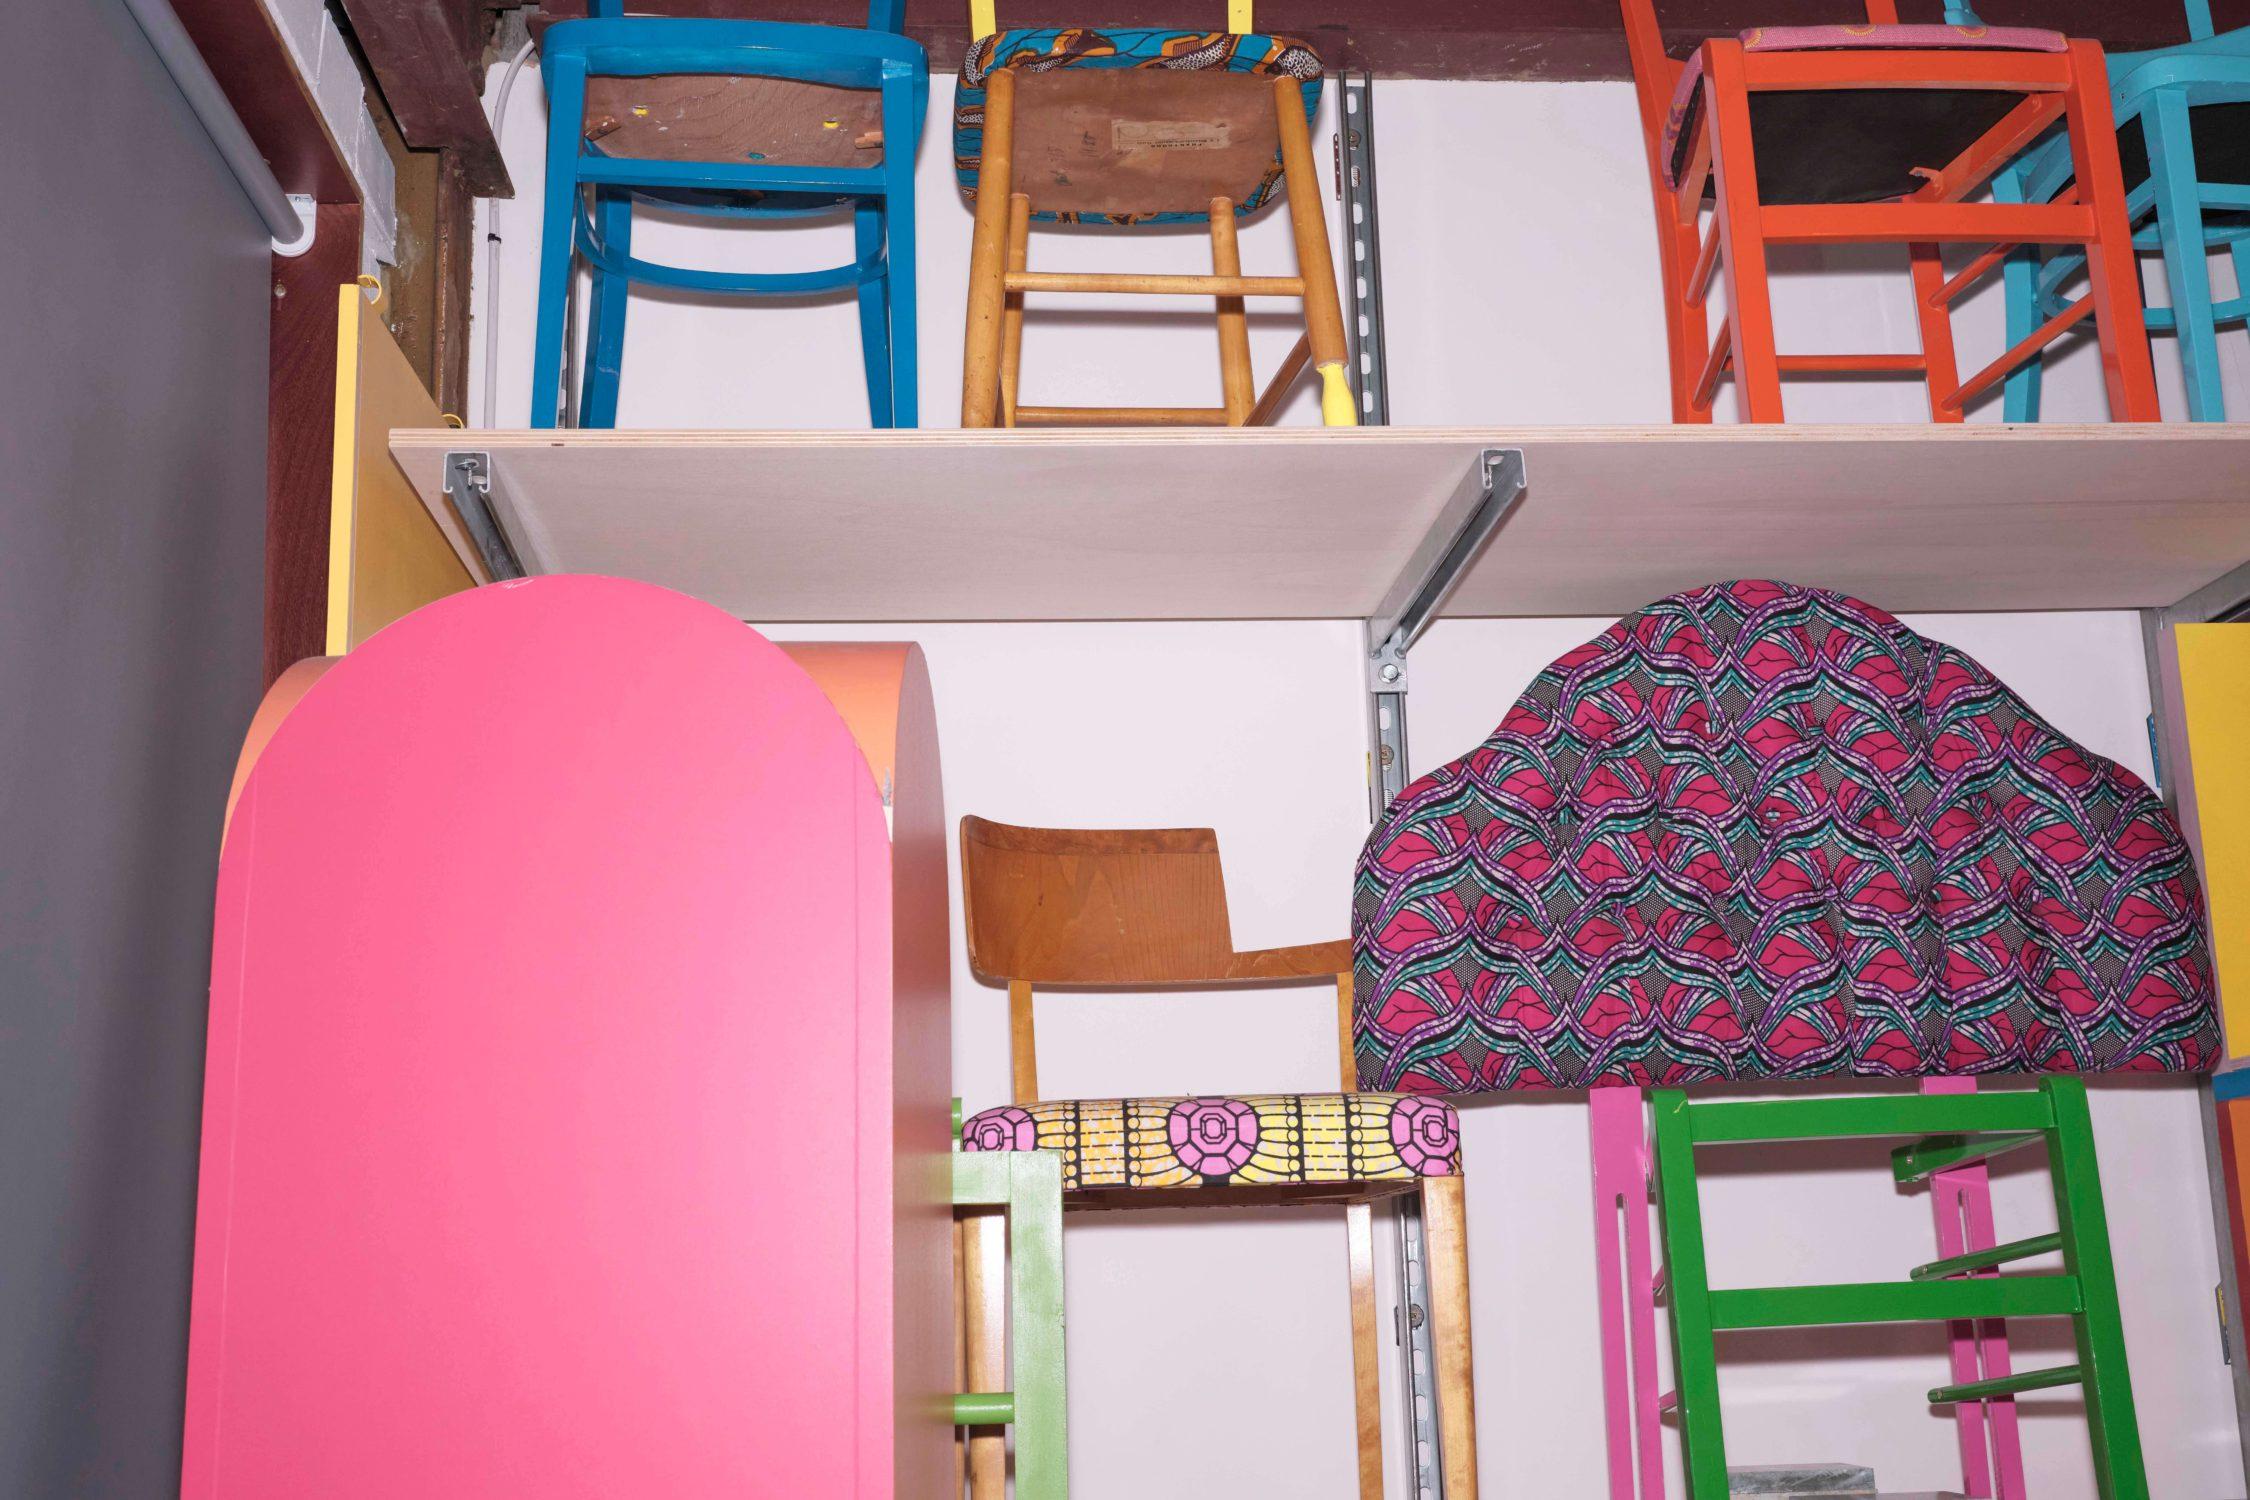 Semaine tastemaker Yinka Ilori colourful chair by Jermaine Francis